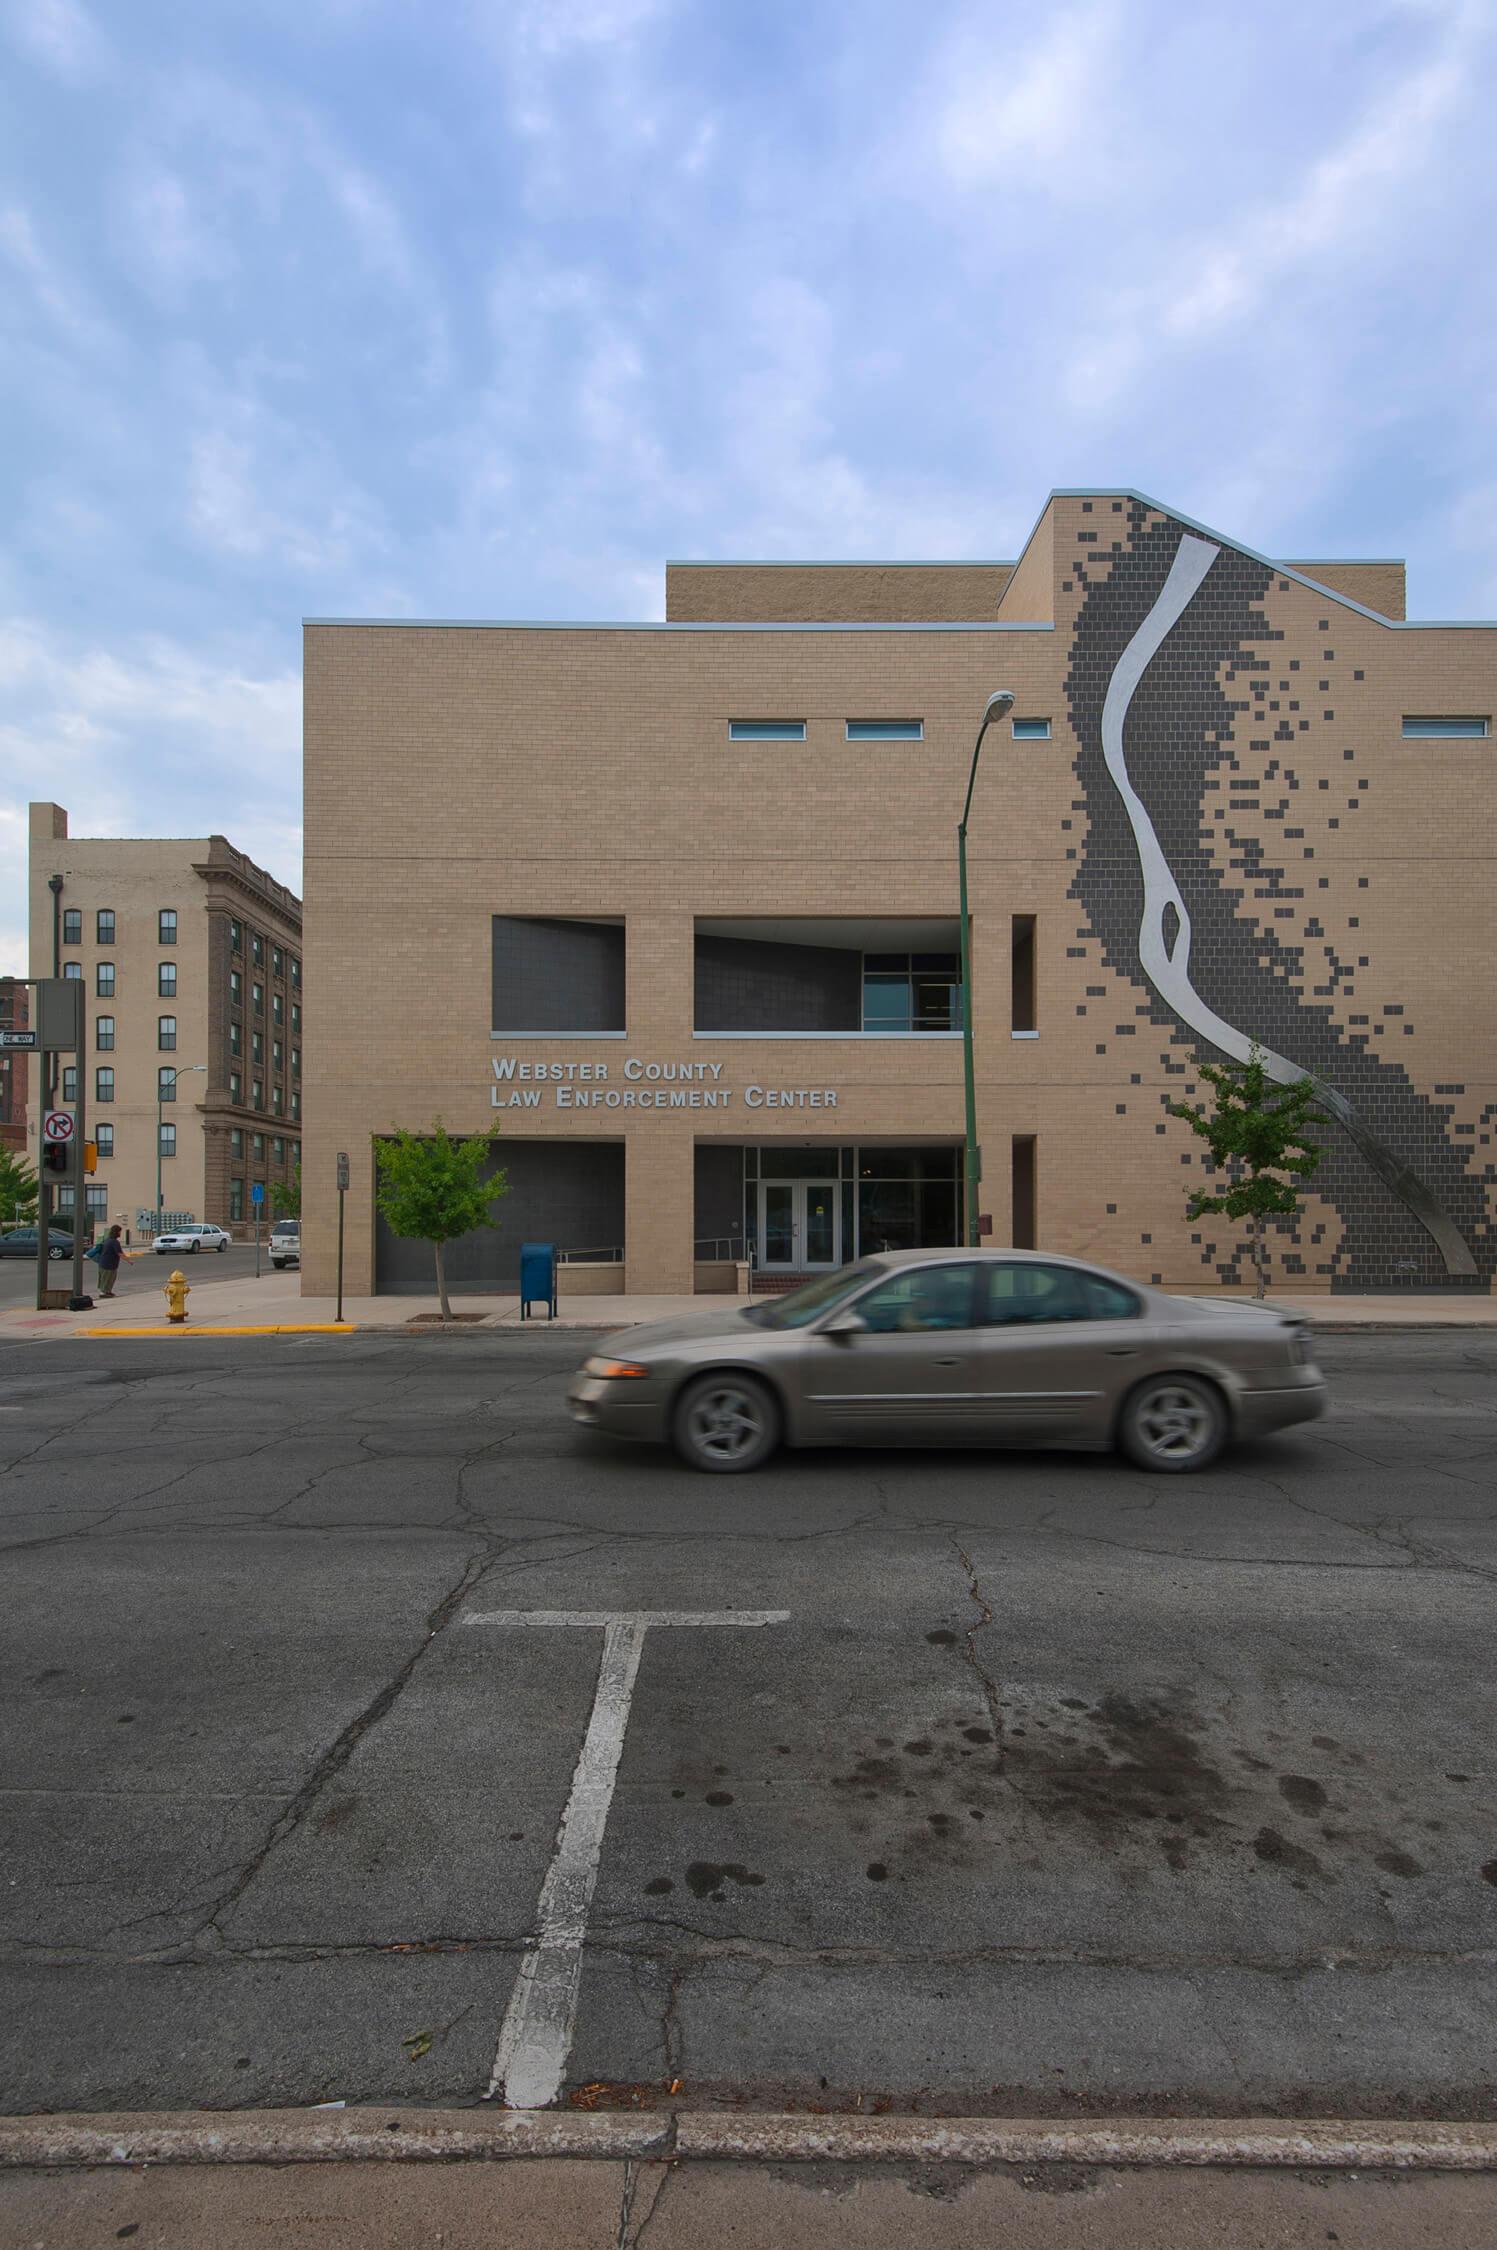 Webster-County-Law-Enforcement-Center-34